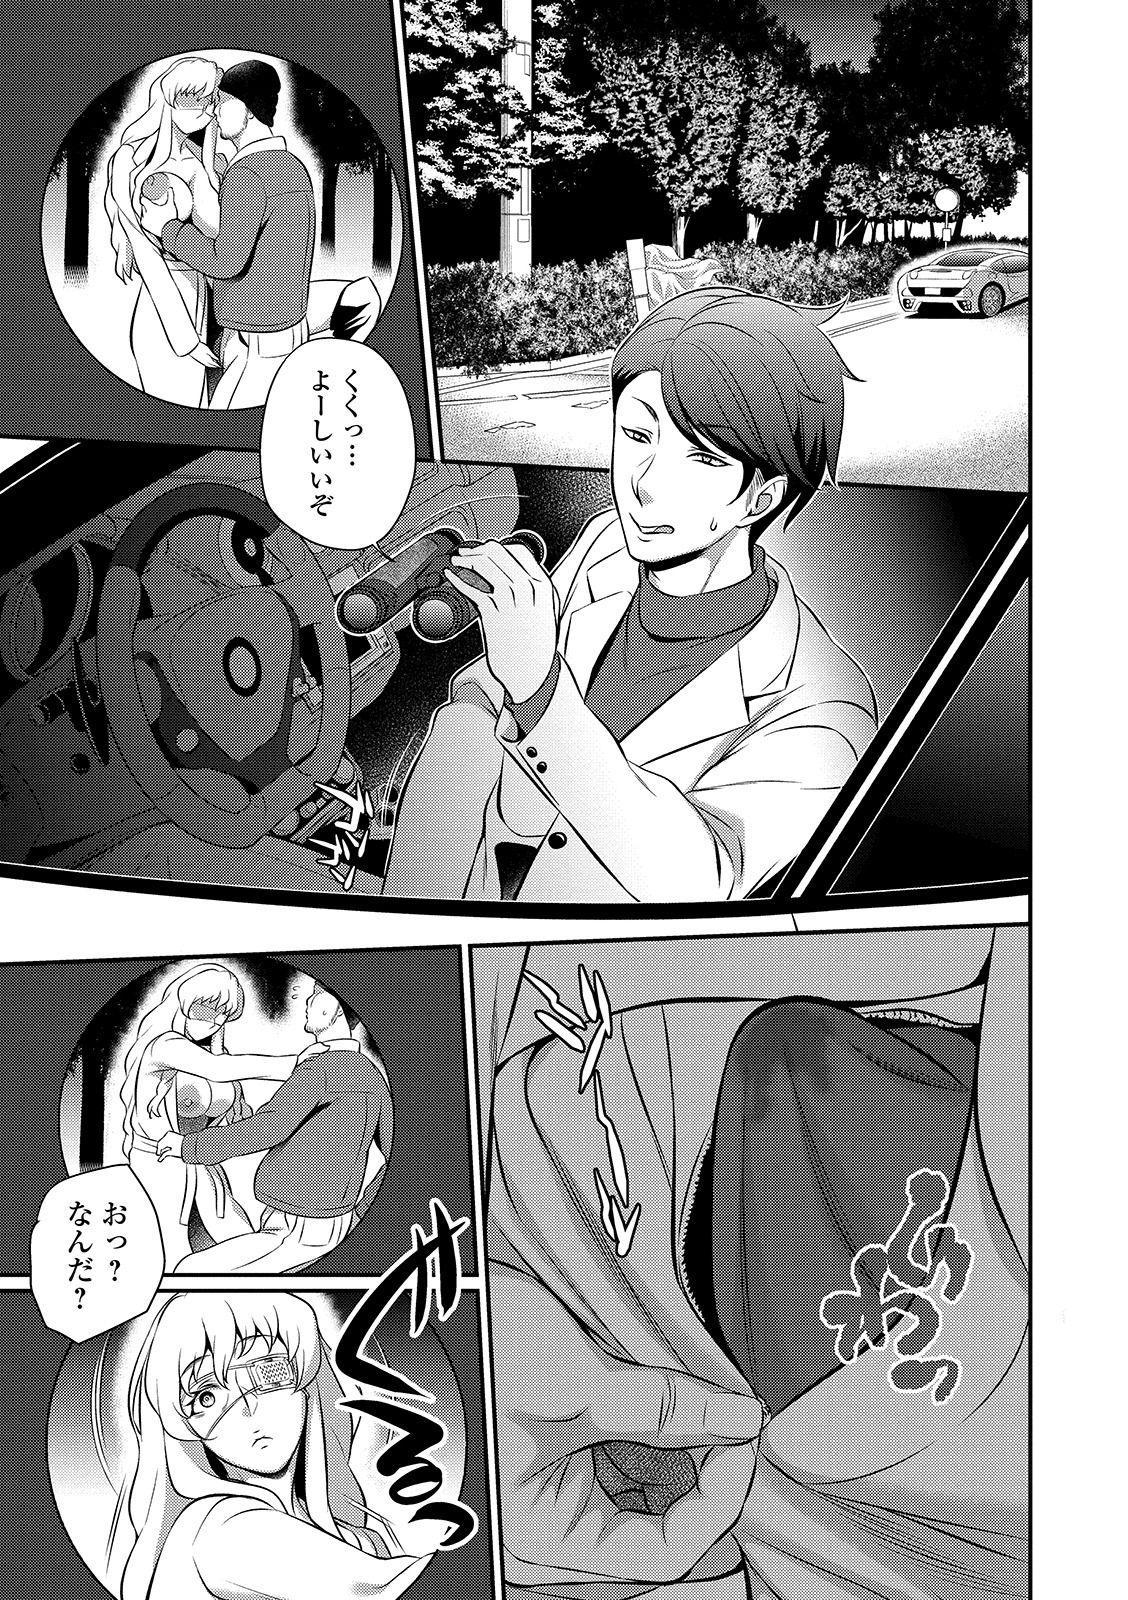 COMIC Shigekiteki SQUIRT!! Vol. 15 240